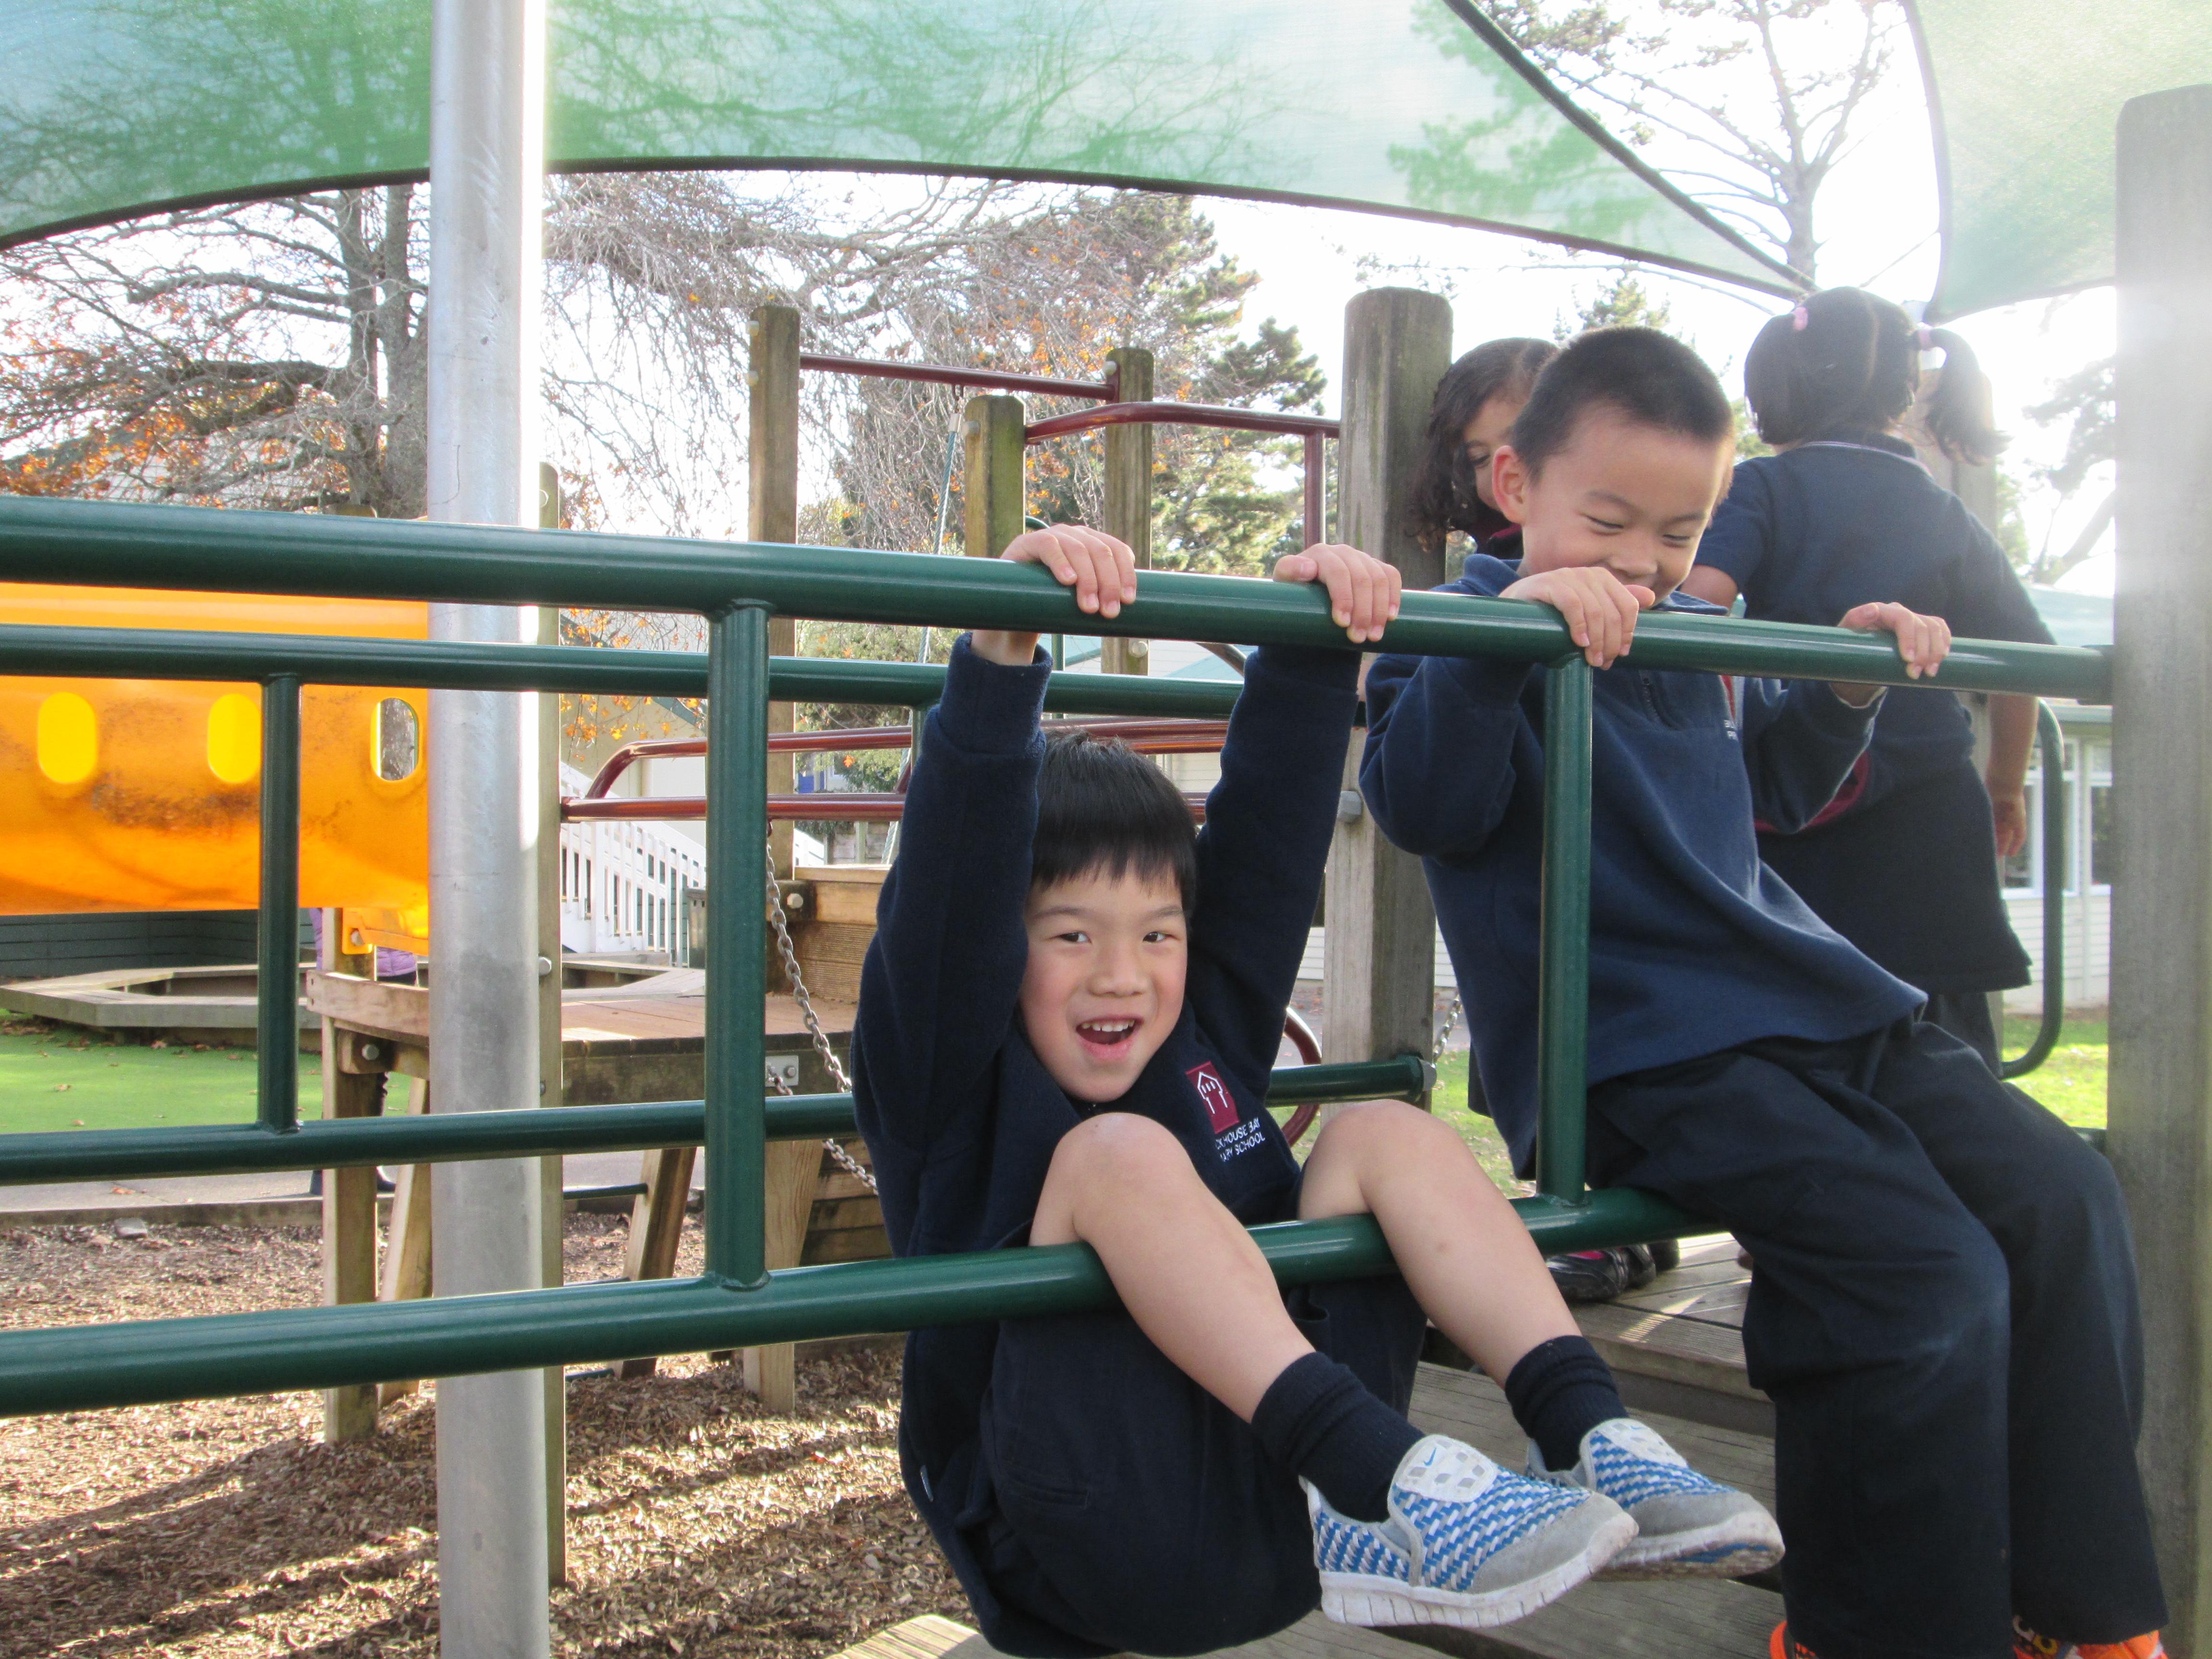 Blockhouse Bay Primary School - Playground fun